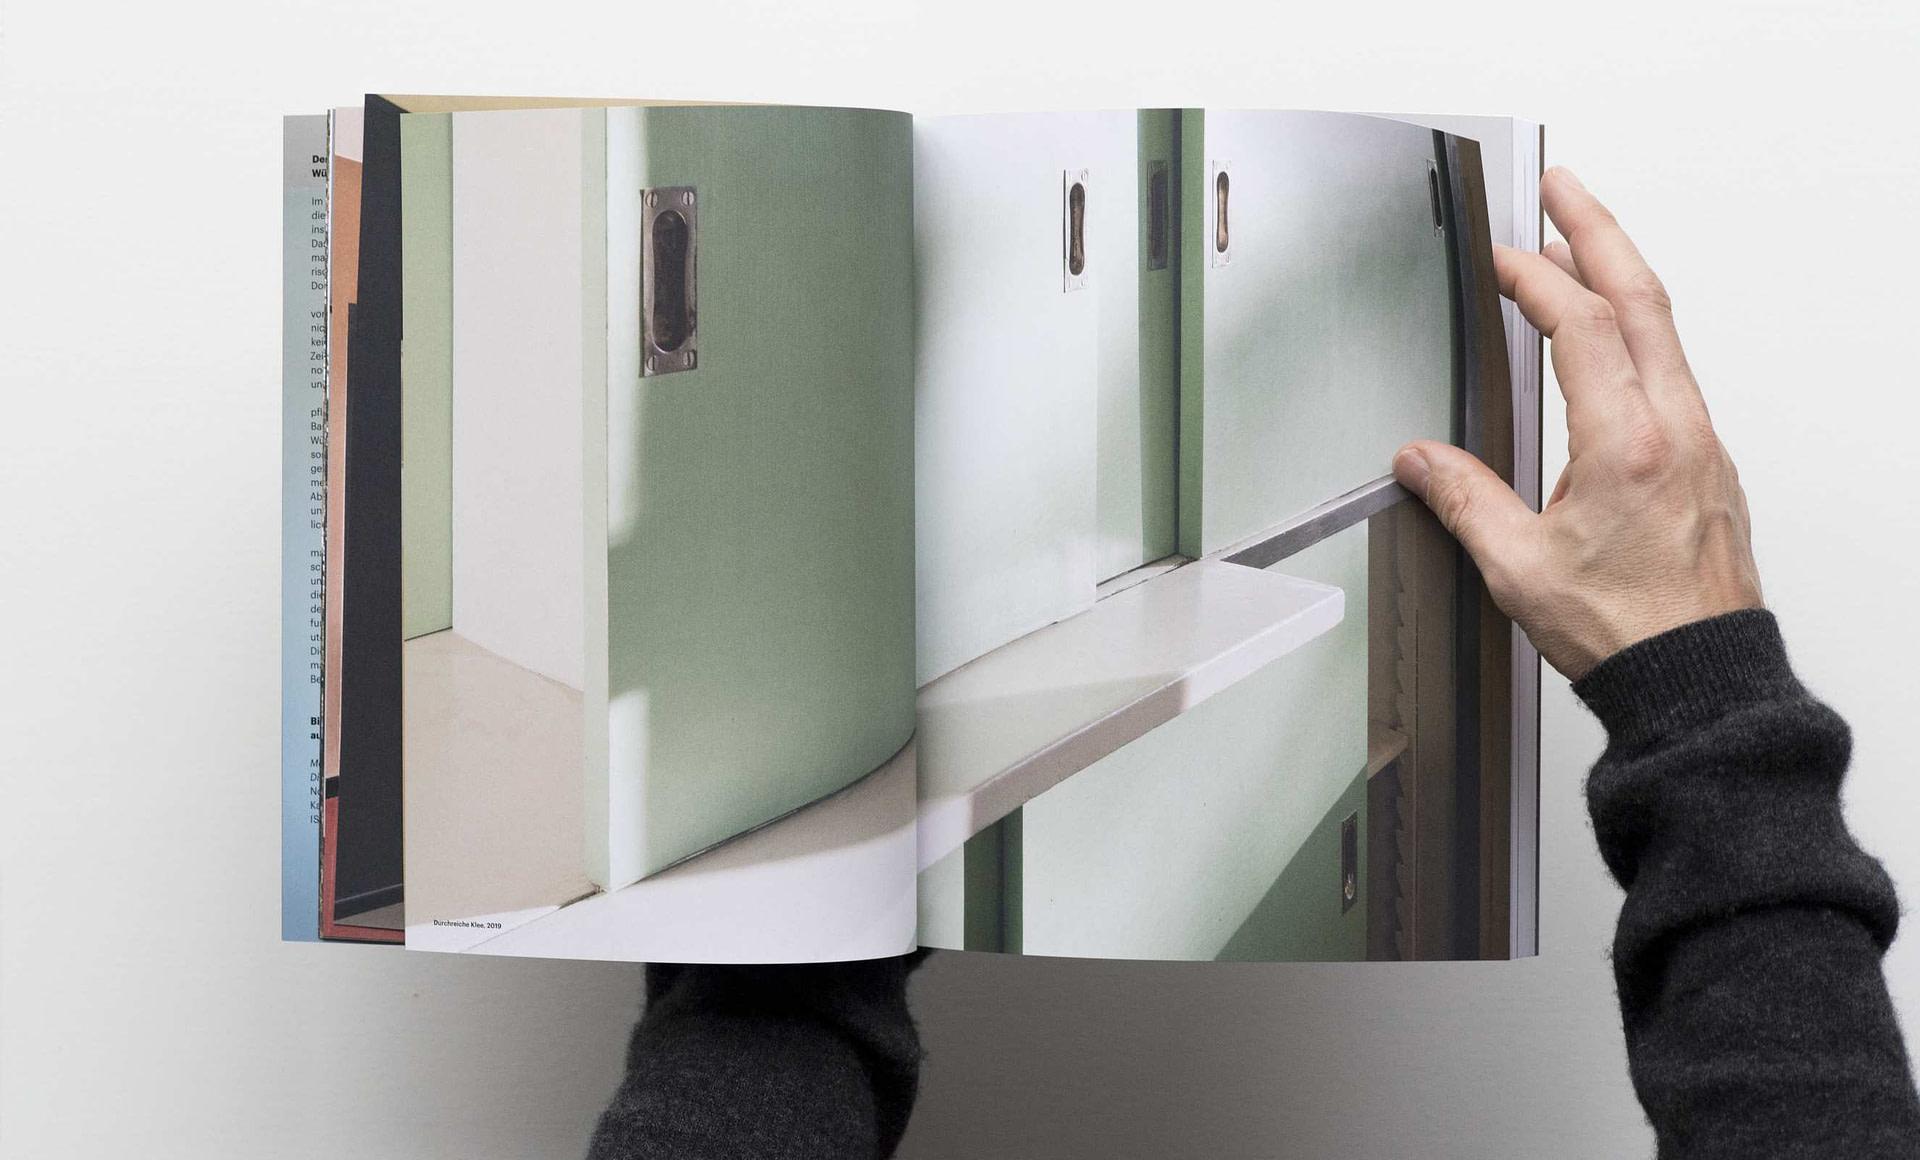 meisterhaus-kandinsky-klee-book-3-2650x1600px